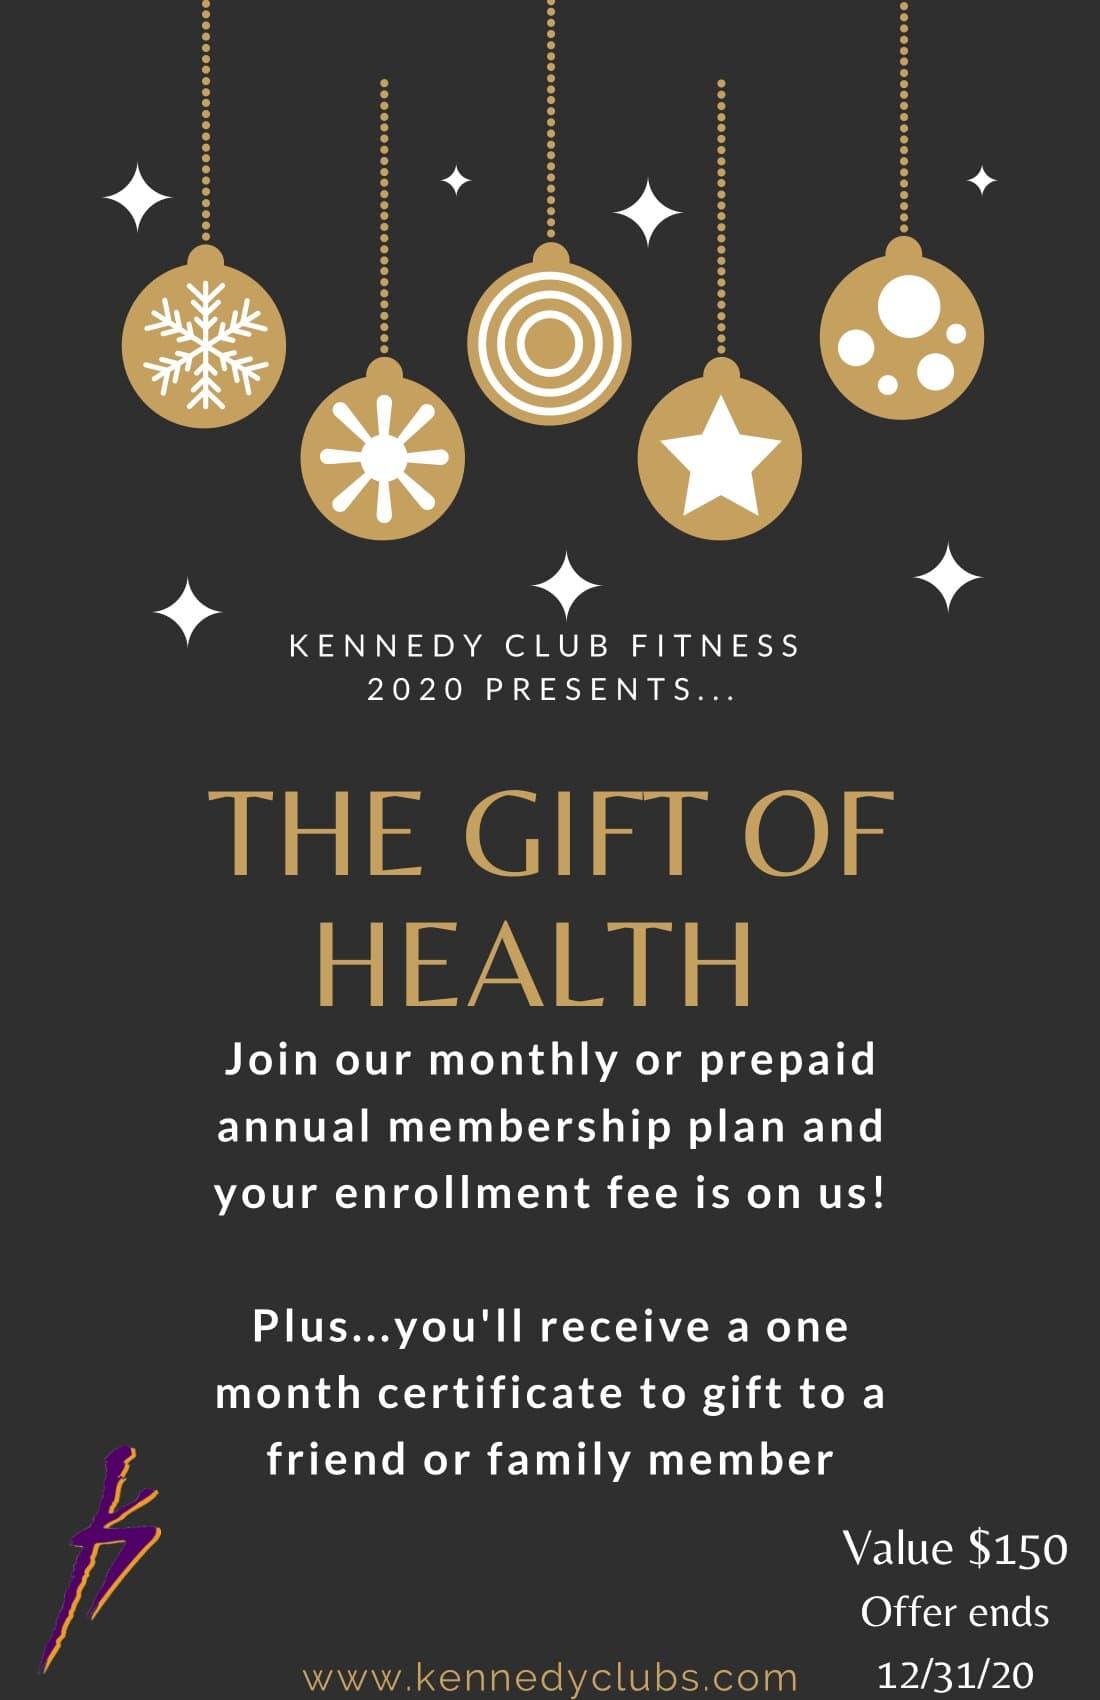 Kennedy Club Fitness Membership Special December 2020